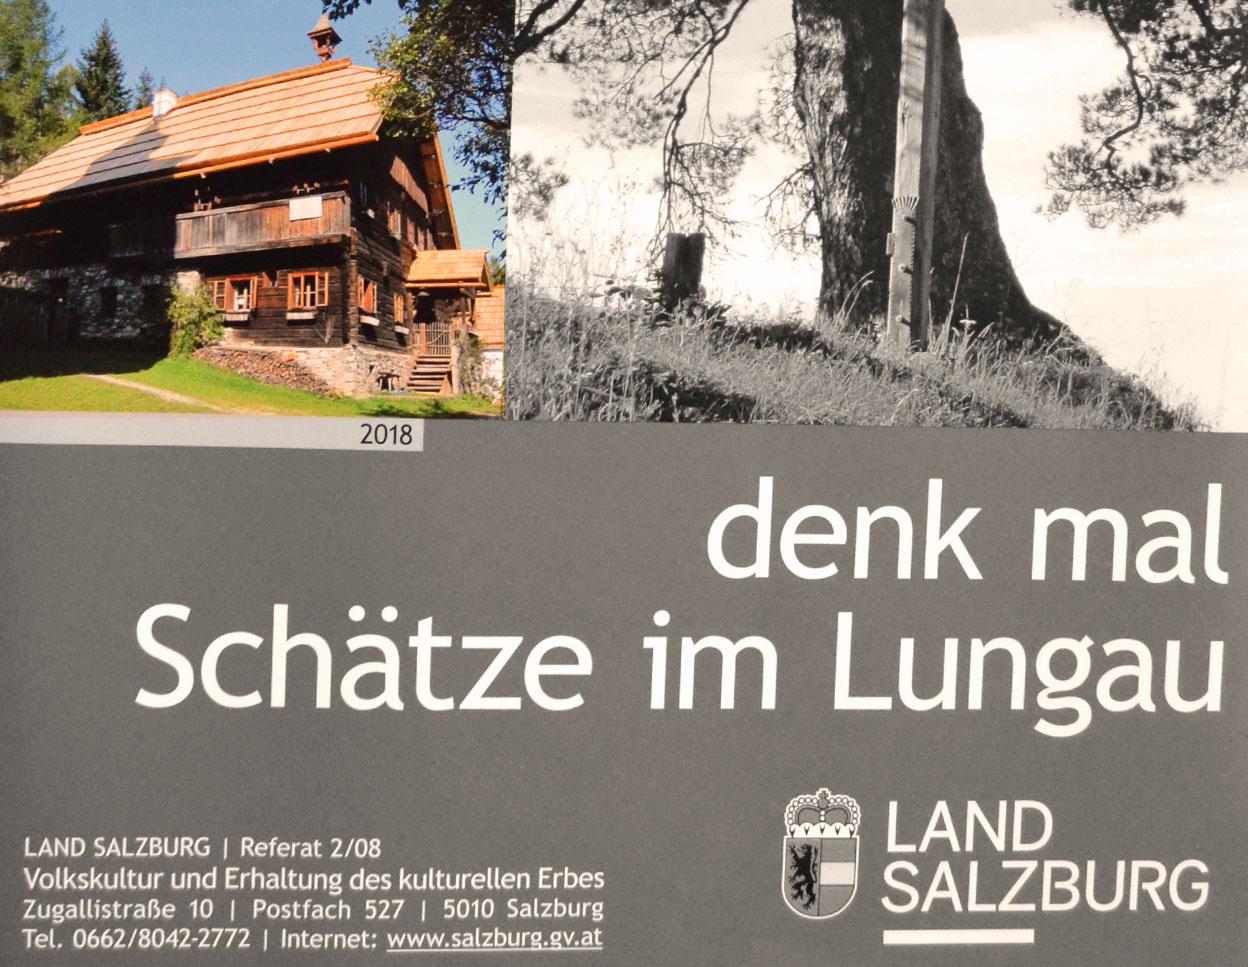 Denkmal Schätze Lungau Mesnerhaus Weißpriach